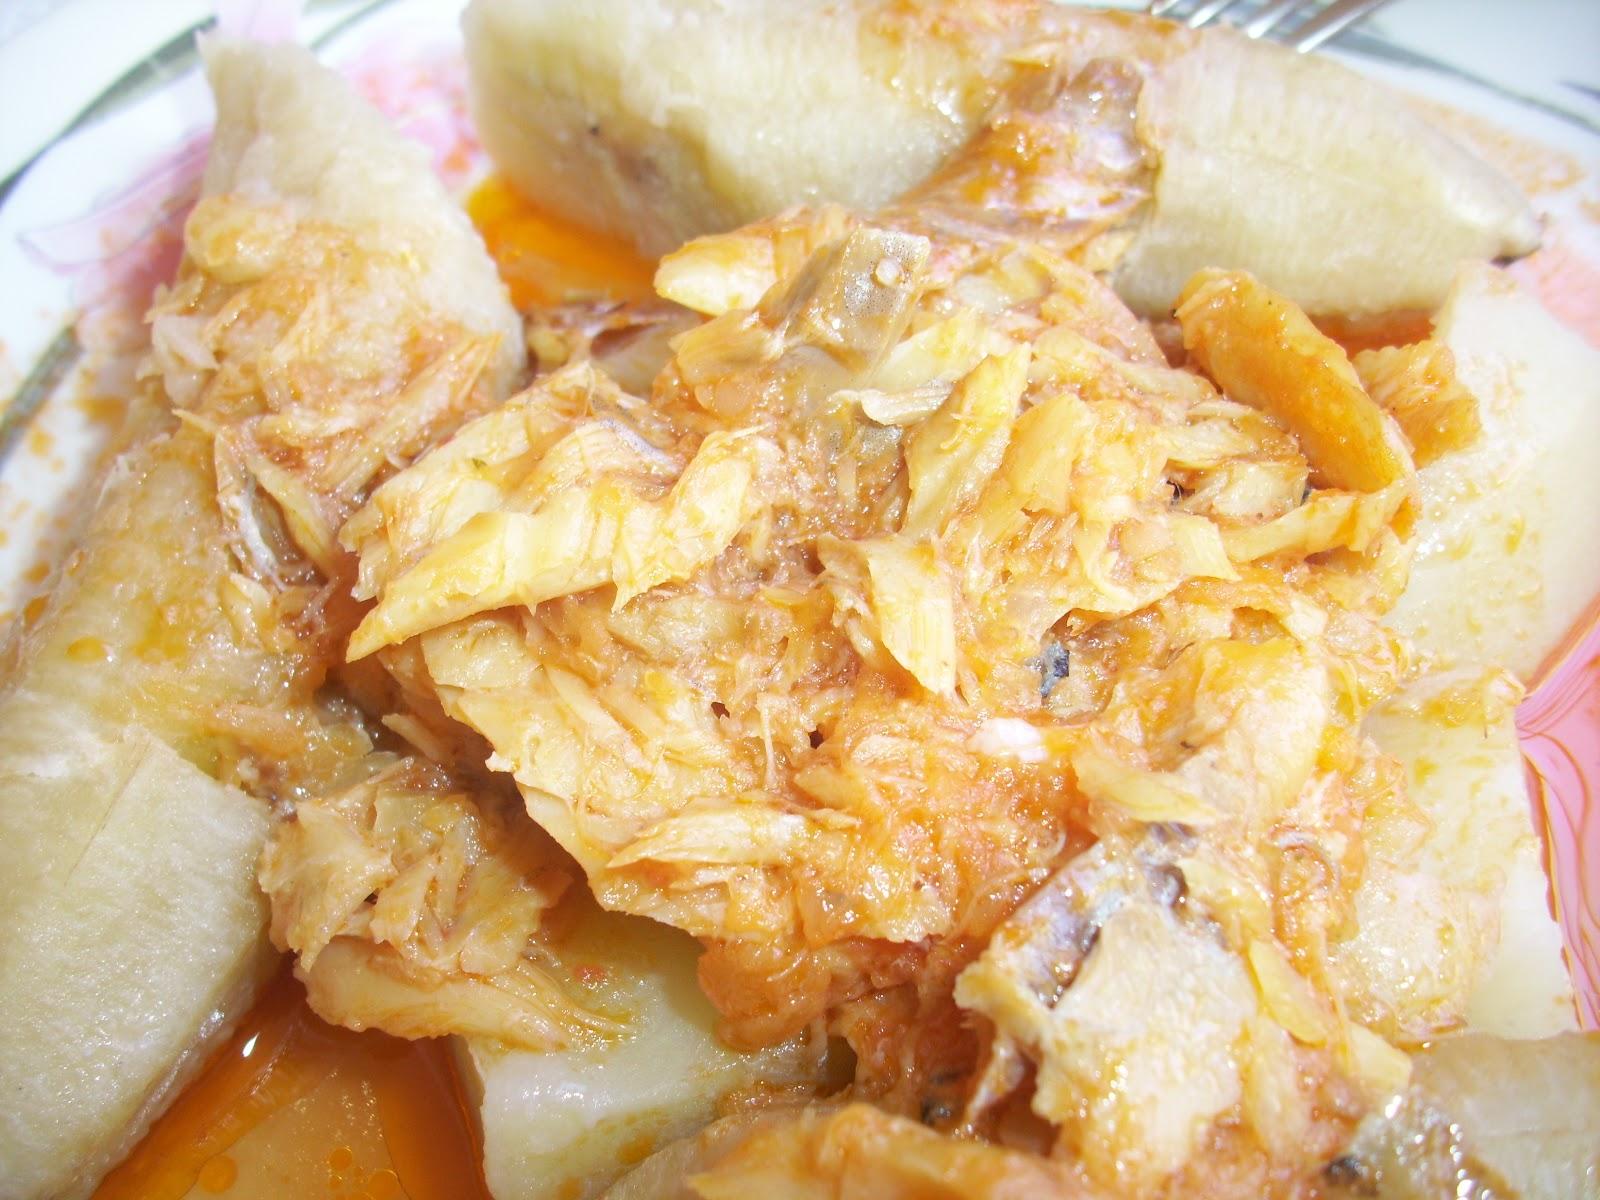 Cocina casera Repblica Dominicana Bacalao guisado acompaado de guineitos verdes y papa